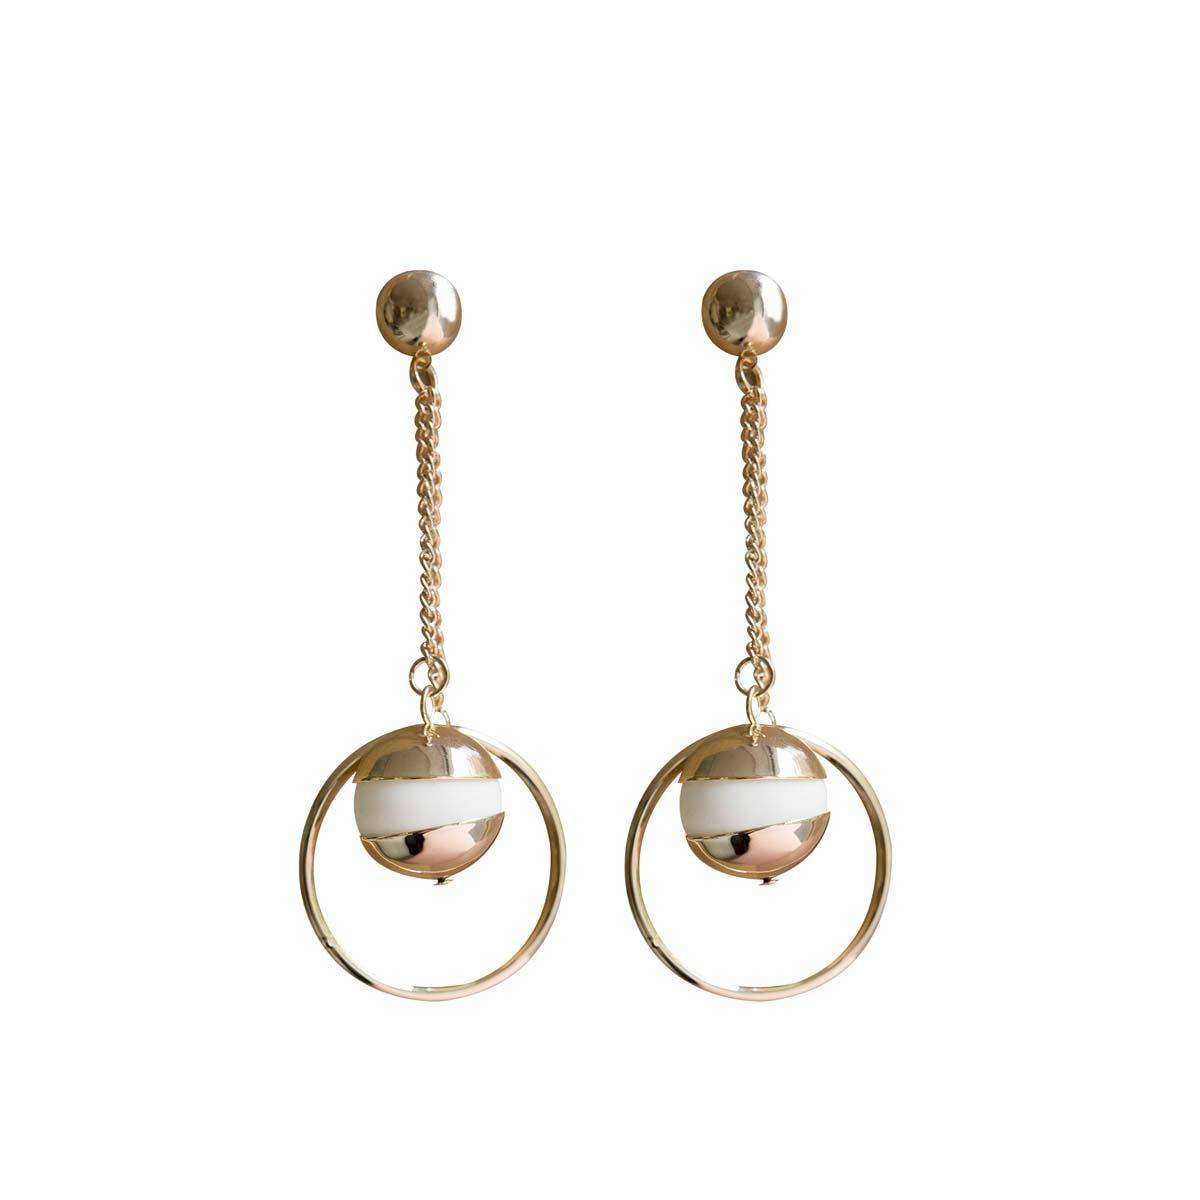 Teria Yabar - Pendientes dorados con perla blanca de resina